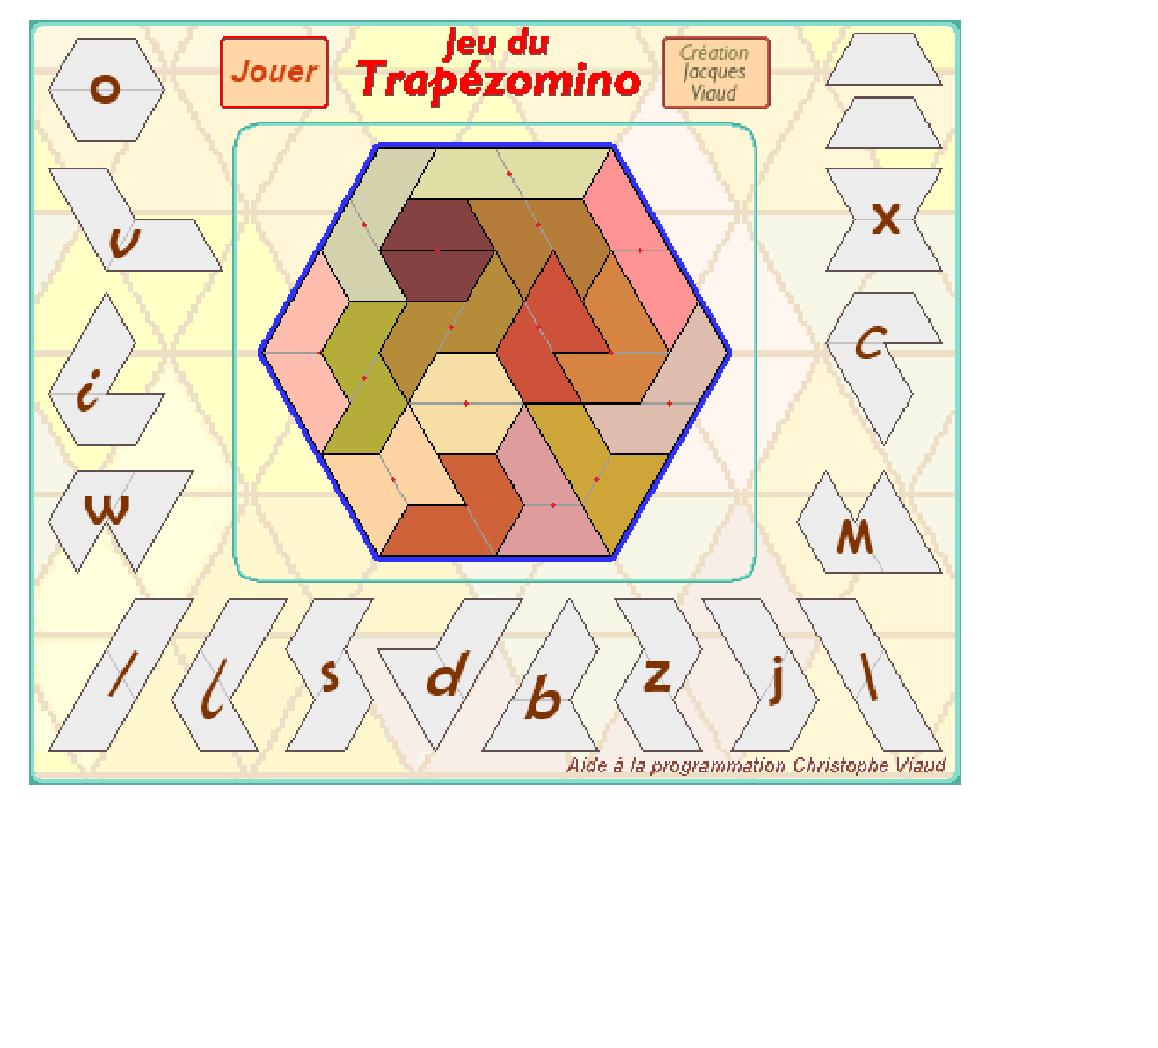 http://www.prise2tete.fr/upload/alorc63-trap3.png